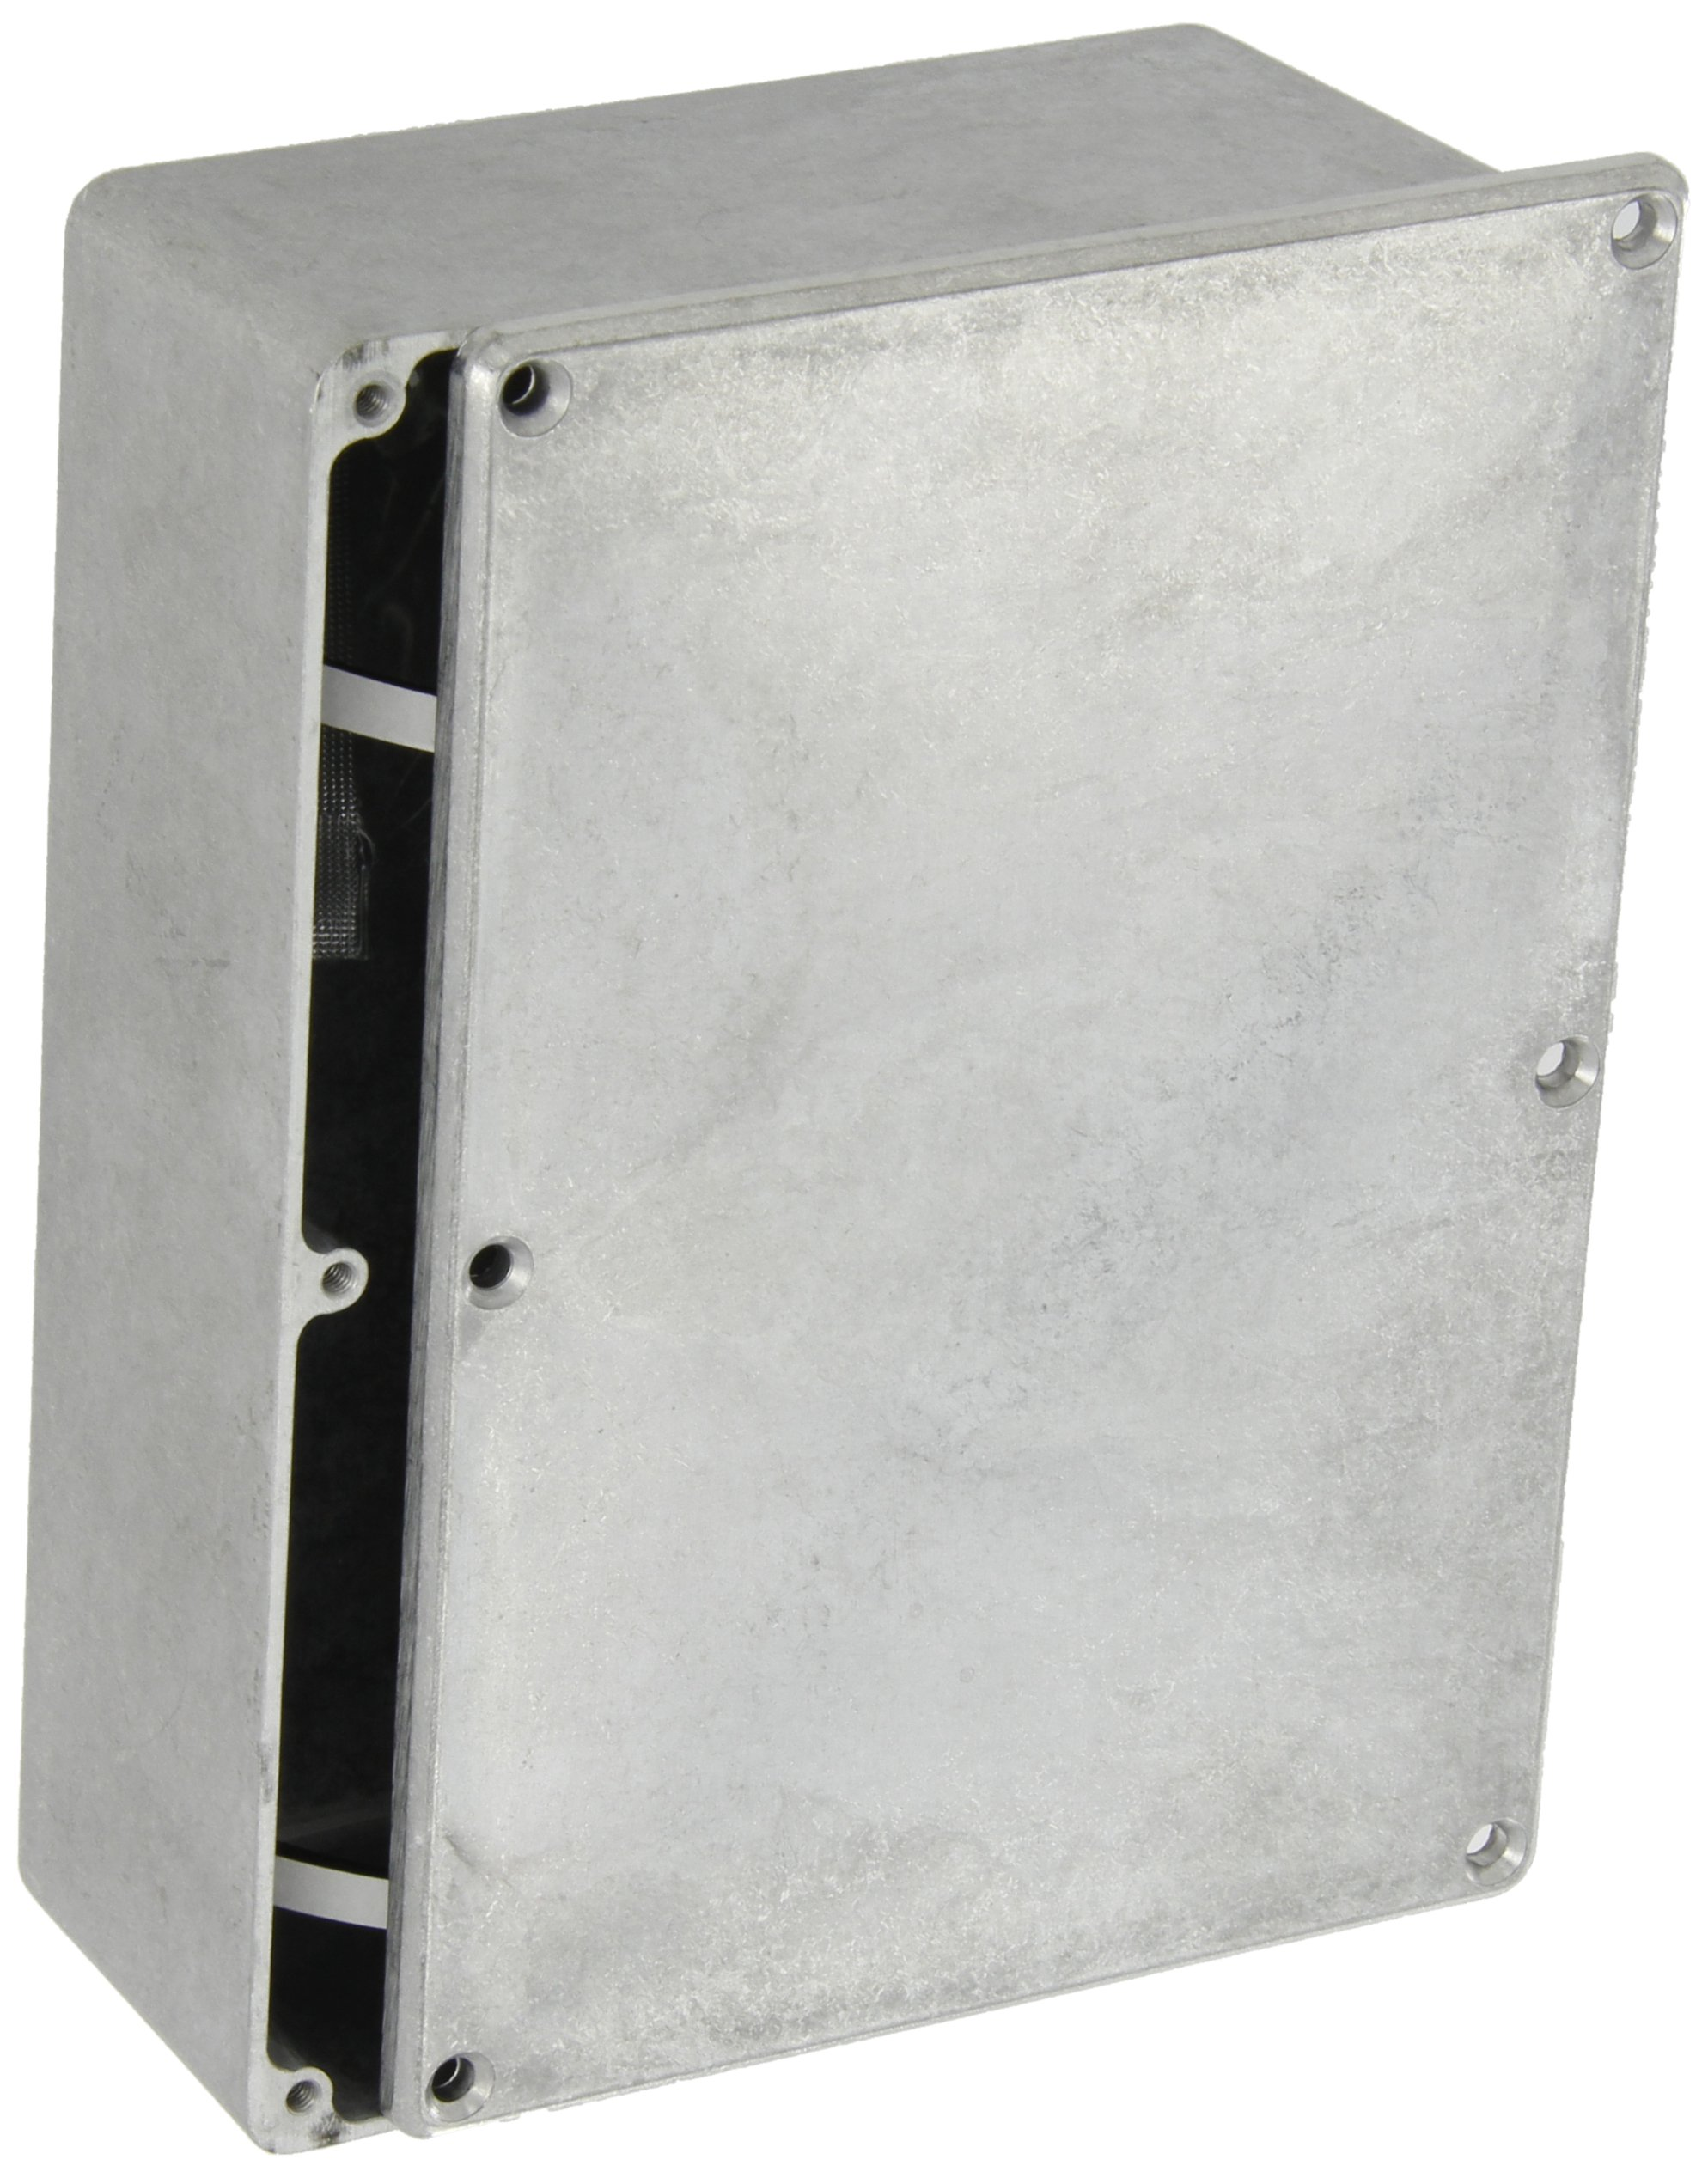 "BUD Industries CN-5709 Die Cast Aluminum Enclosure, 6-49/64"" Length x 4-49/64"" Width x 2-7/32"" Height, Natural Finish"